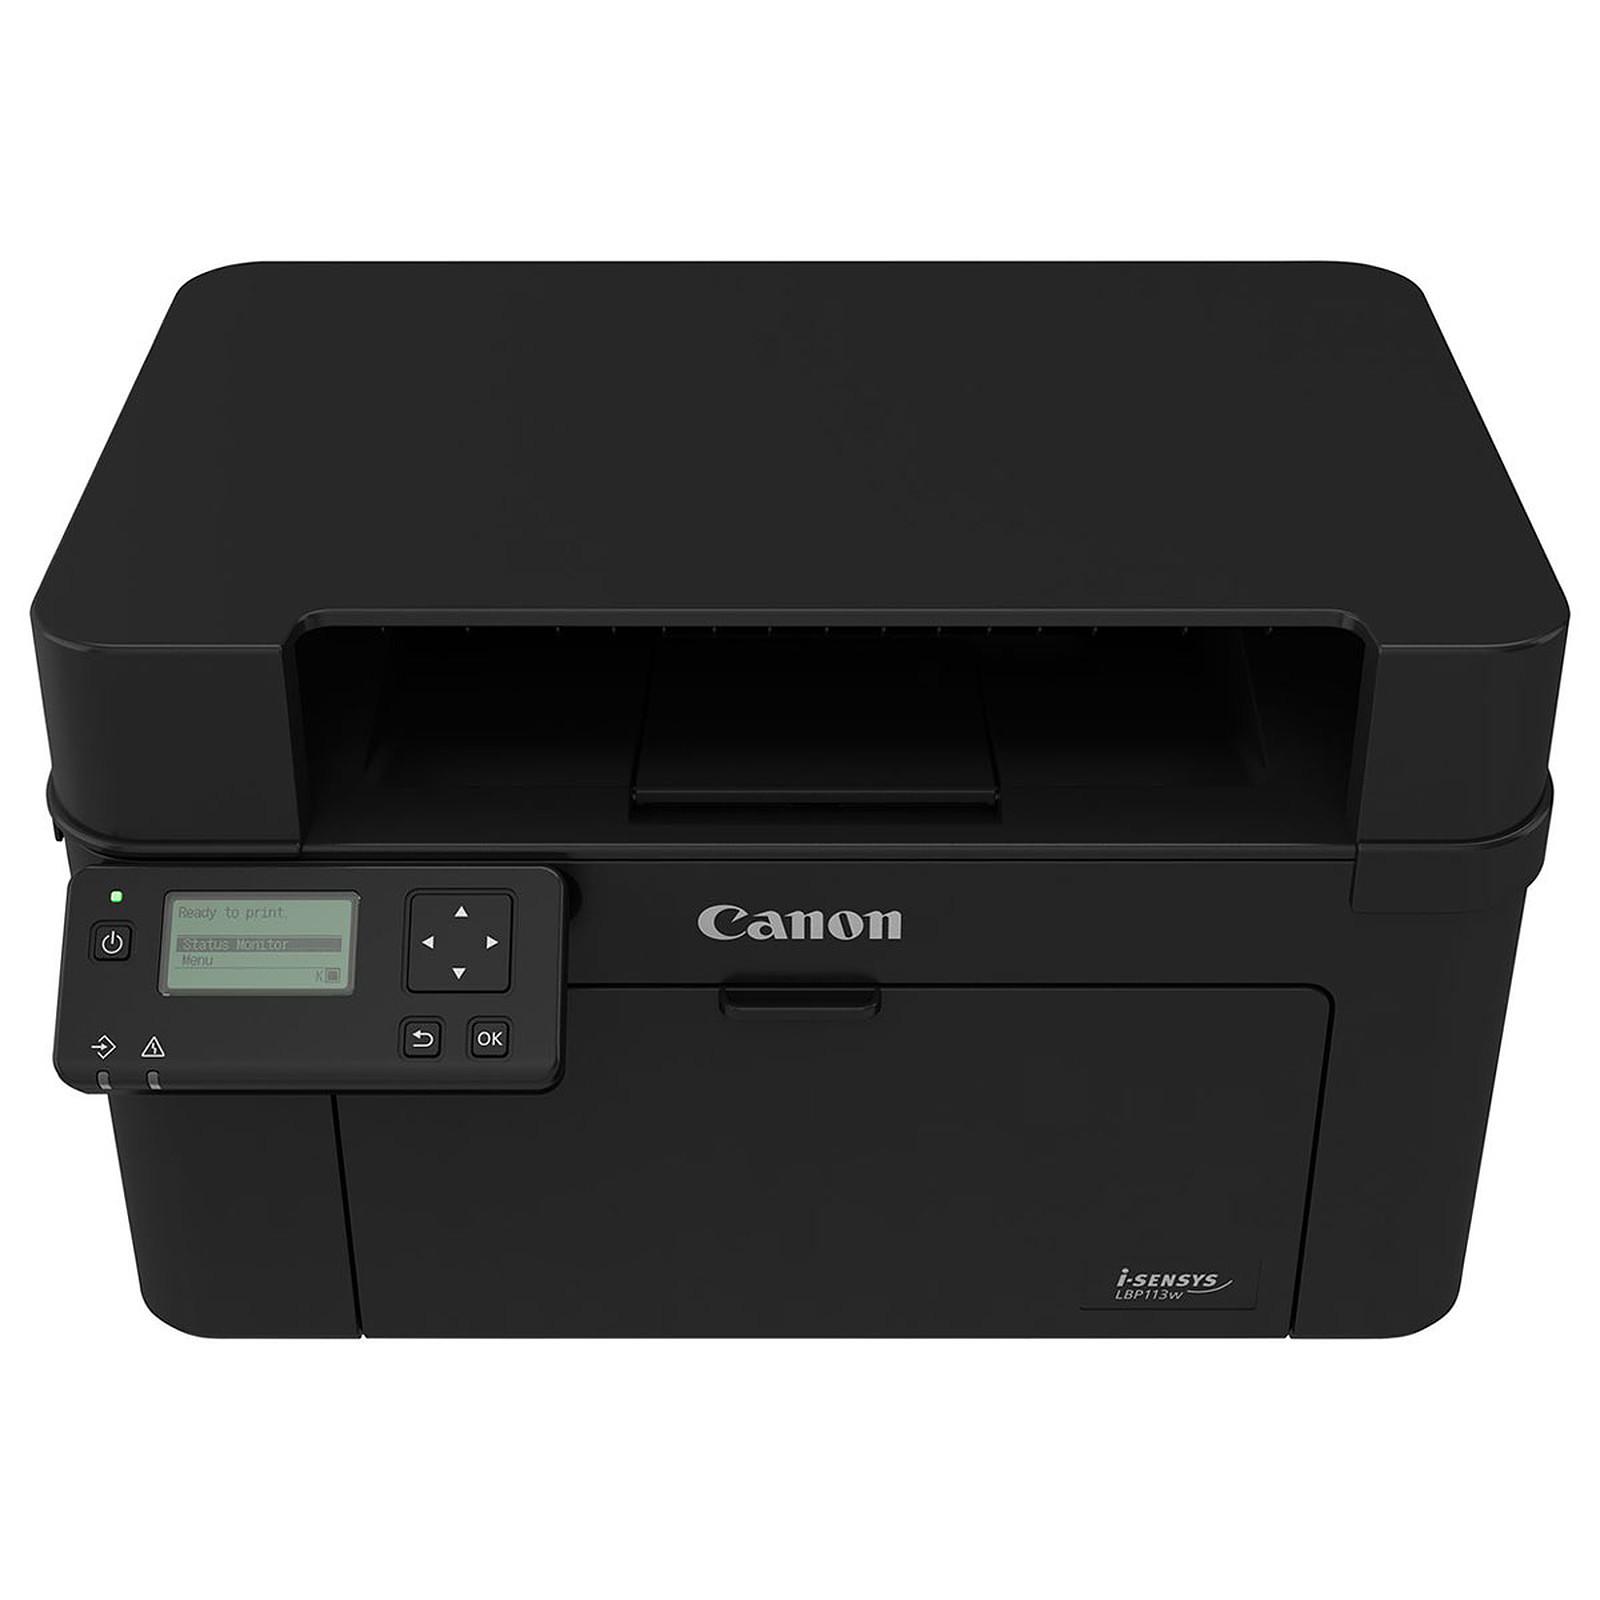 Imprimante Canon I-SENSYS LBP113W - Cybertek.fr - 0